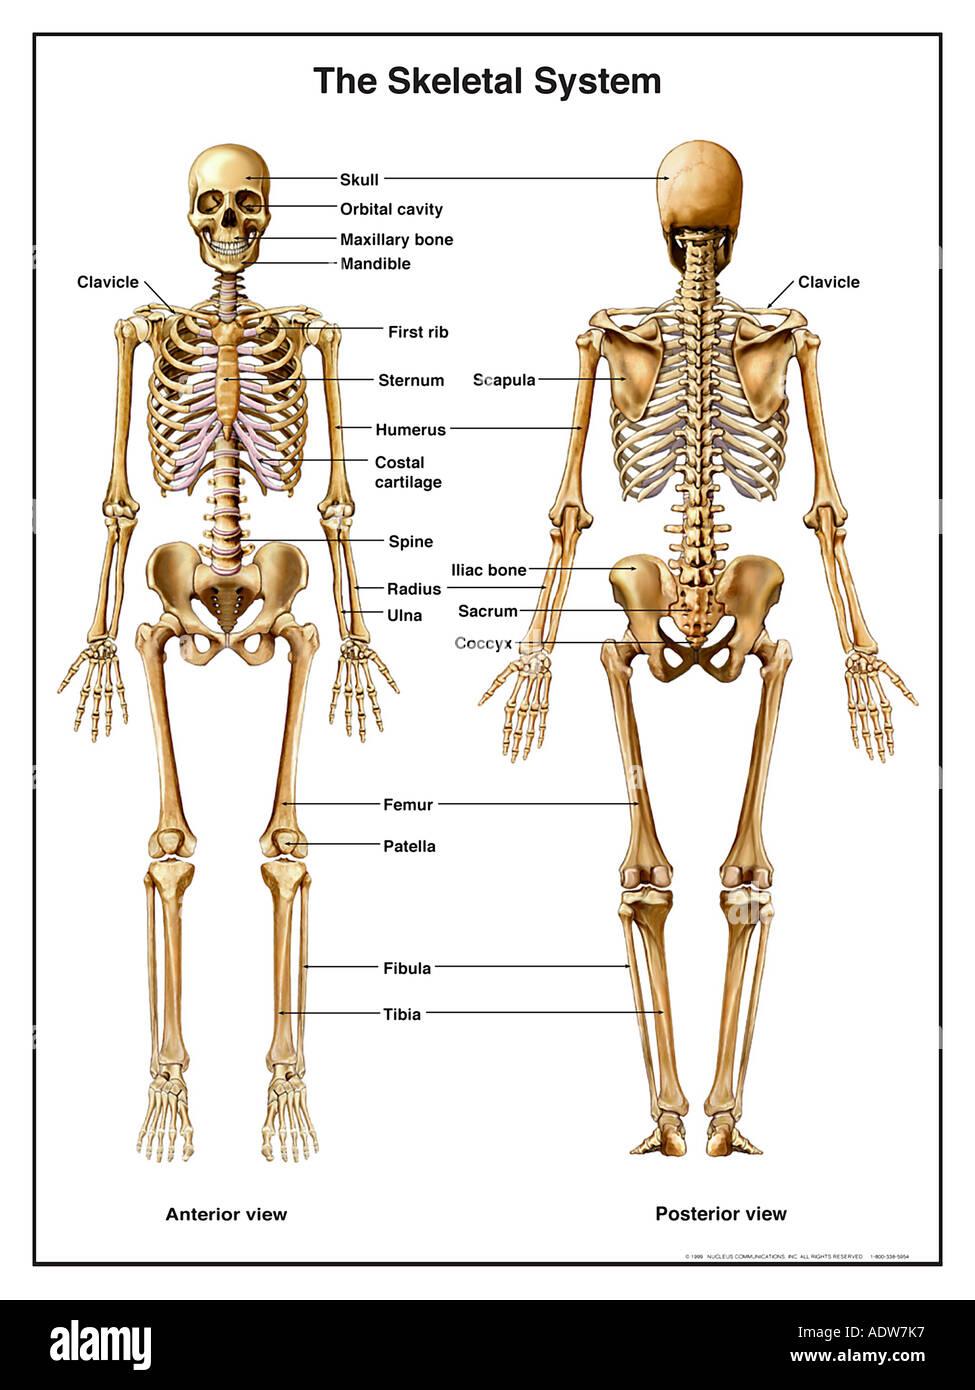 Anatomy of the Skeletal System Stock Photo: 7712374 - Alamy